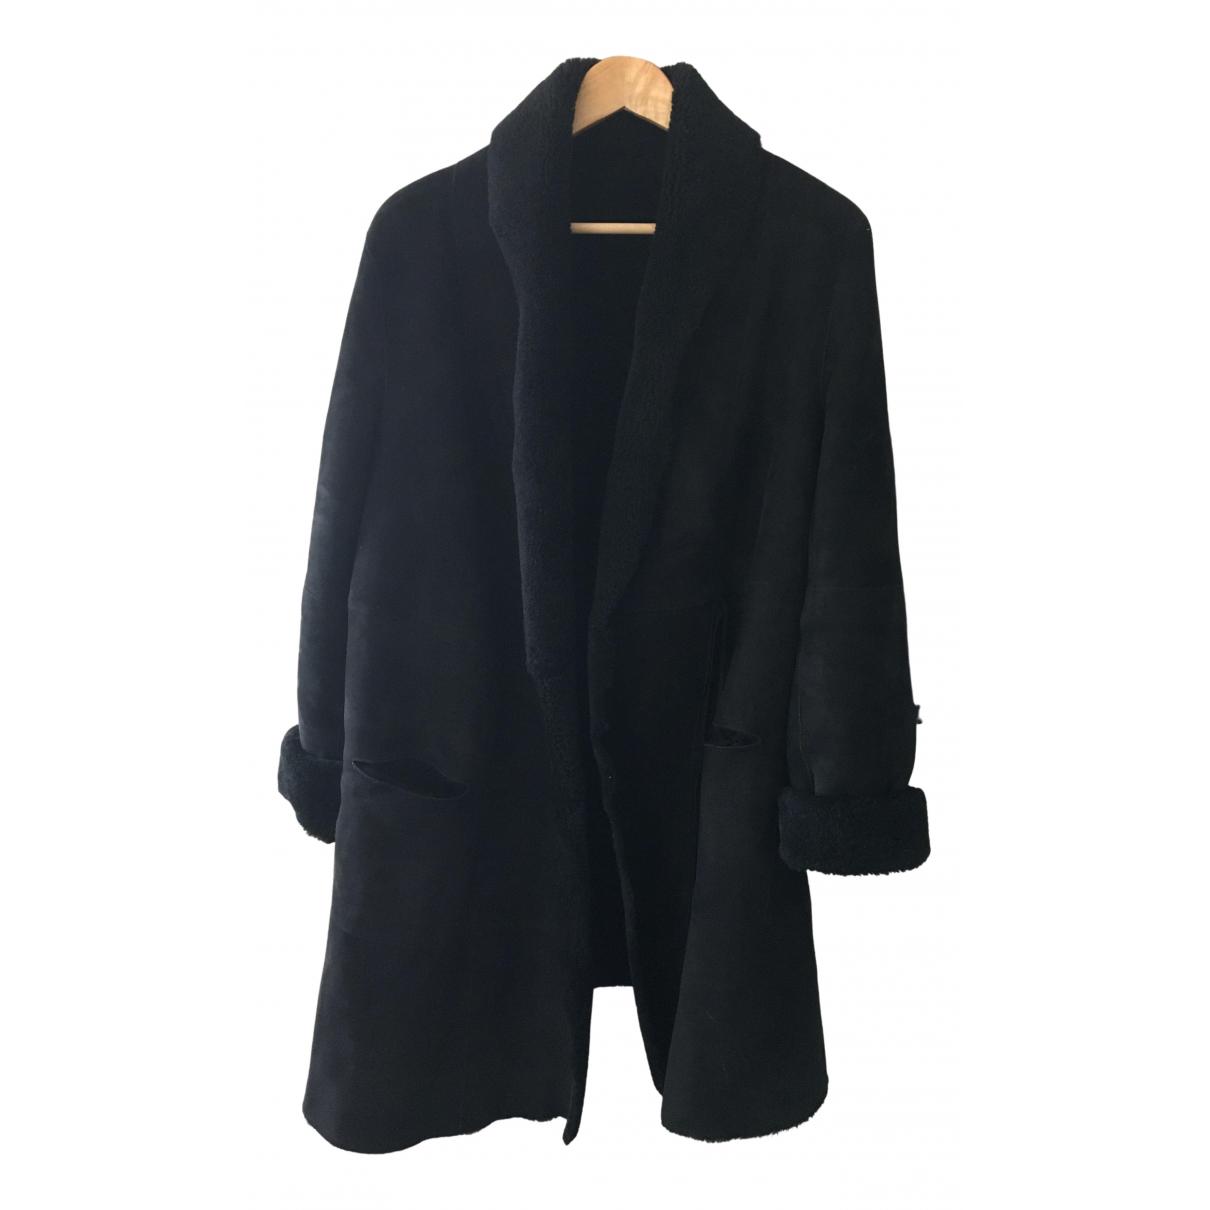 Swildens \N Black Suede coat for Women 40 FR